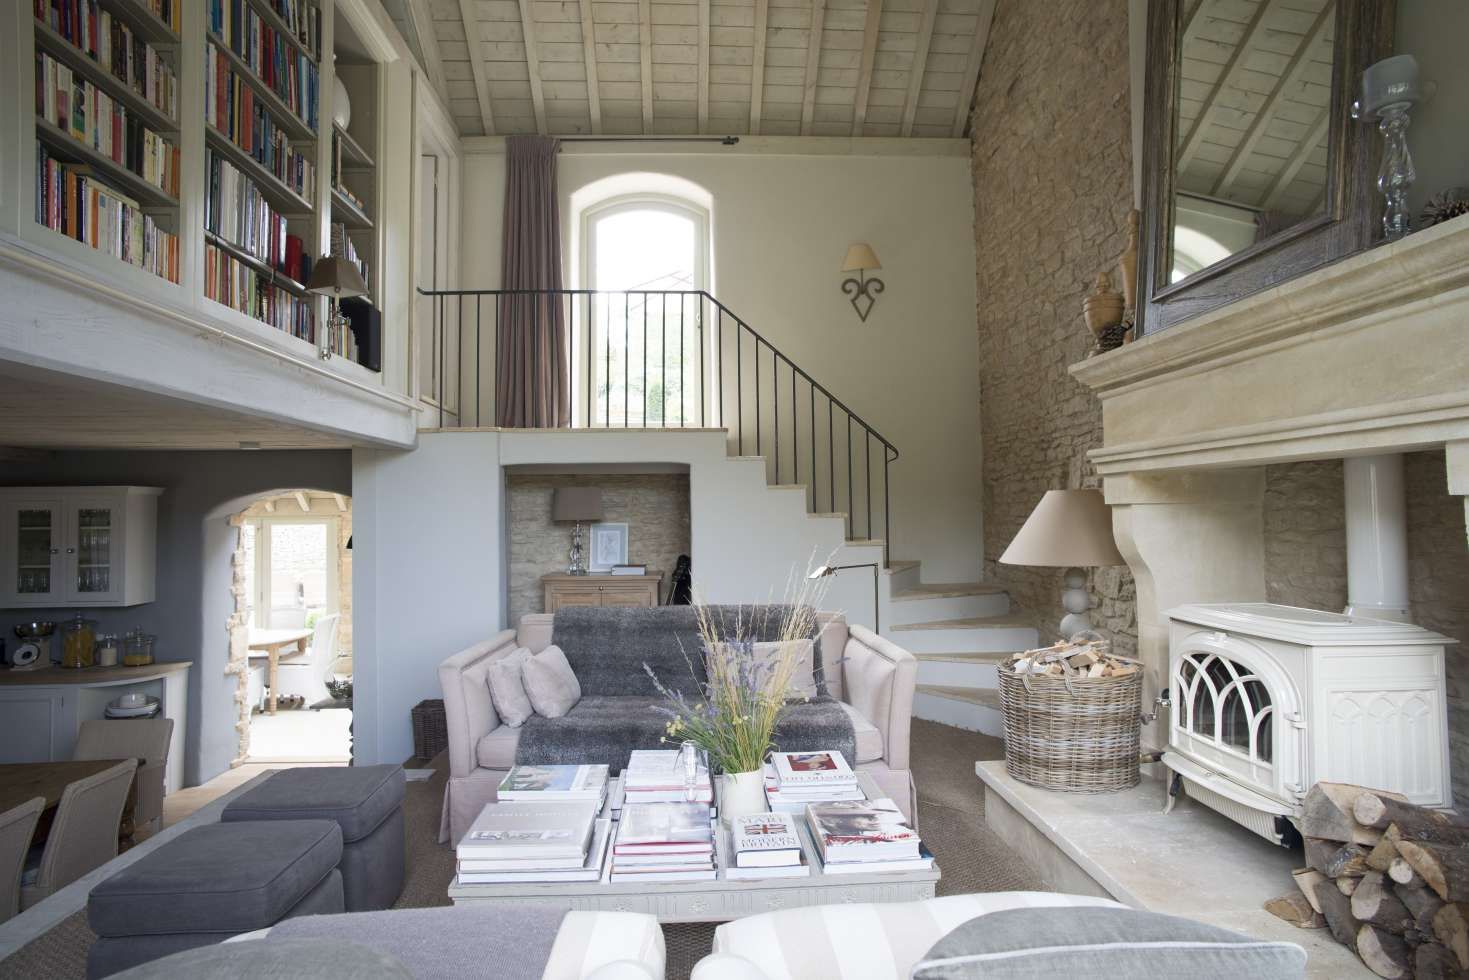 Resultado De Imagen Para Schuur Ombouwen Tot Woning Oude Woning Con Imagenes Decor Inspiration Tiny House Rooms Decored